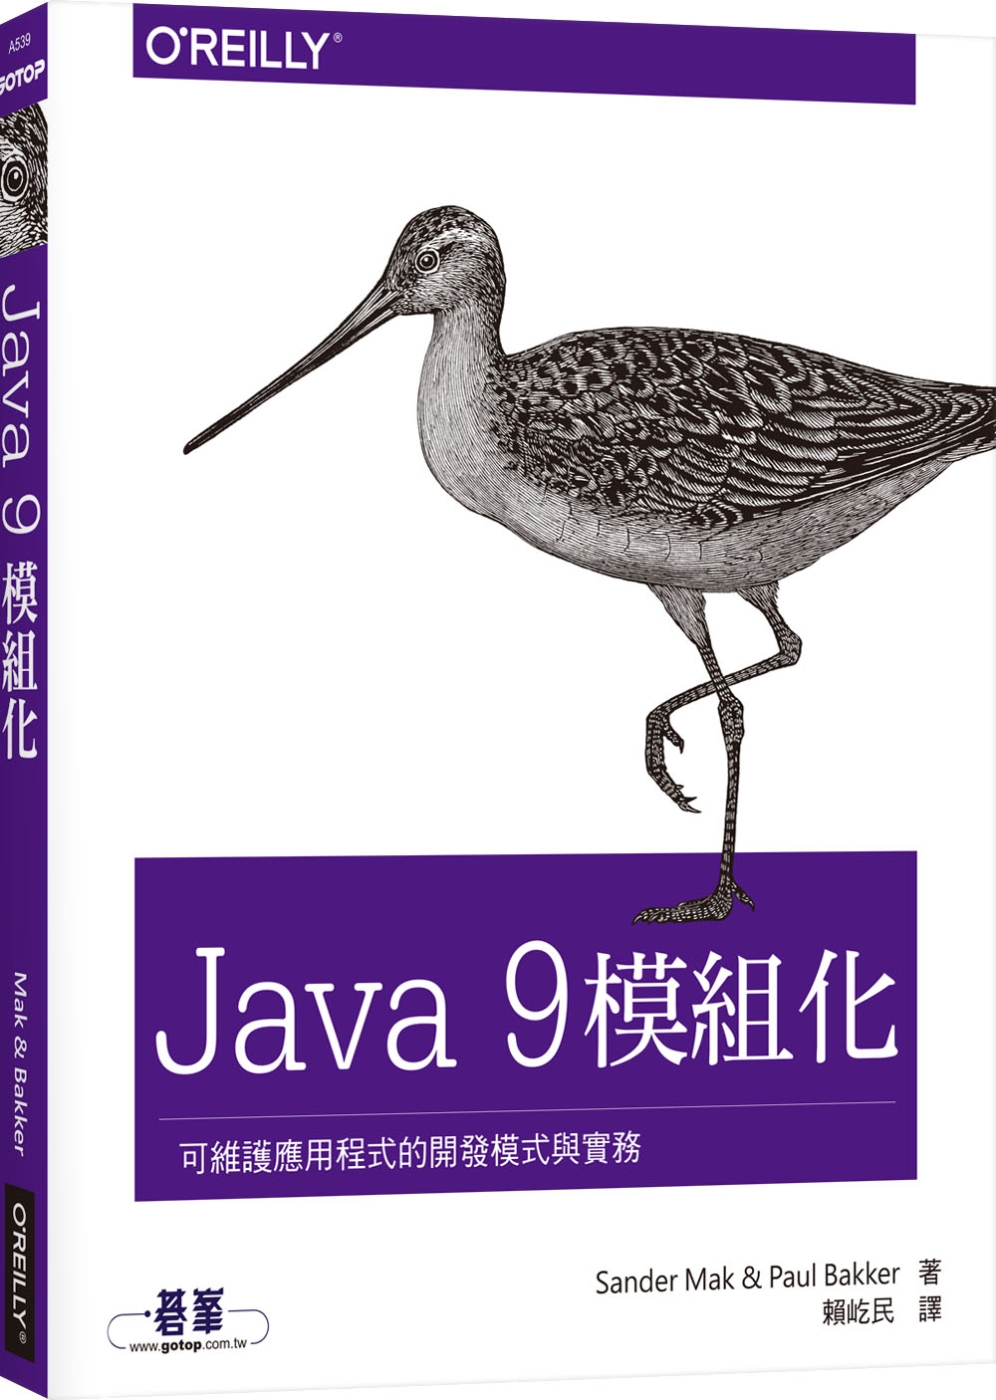 Java 9 模組化:可維護應用程式的開發模式與實務